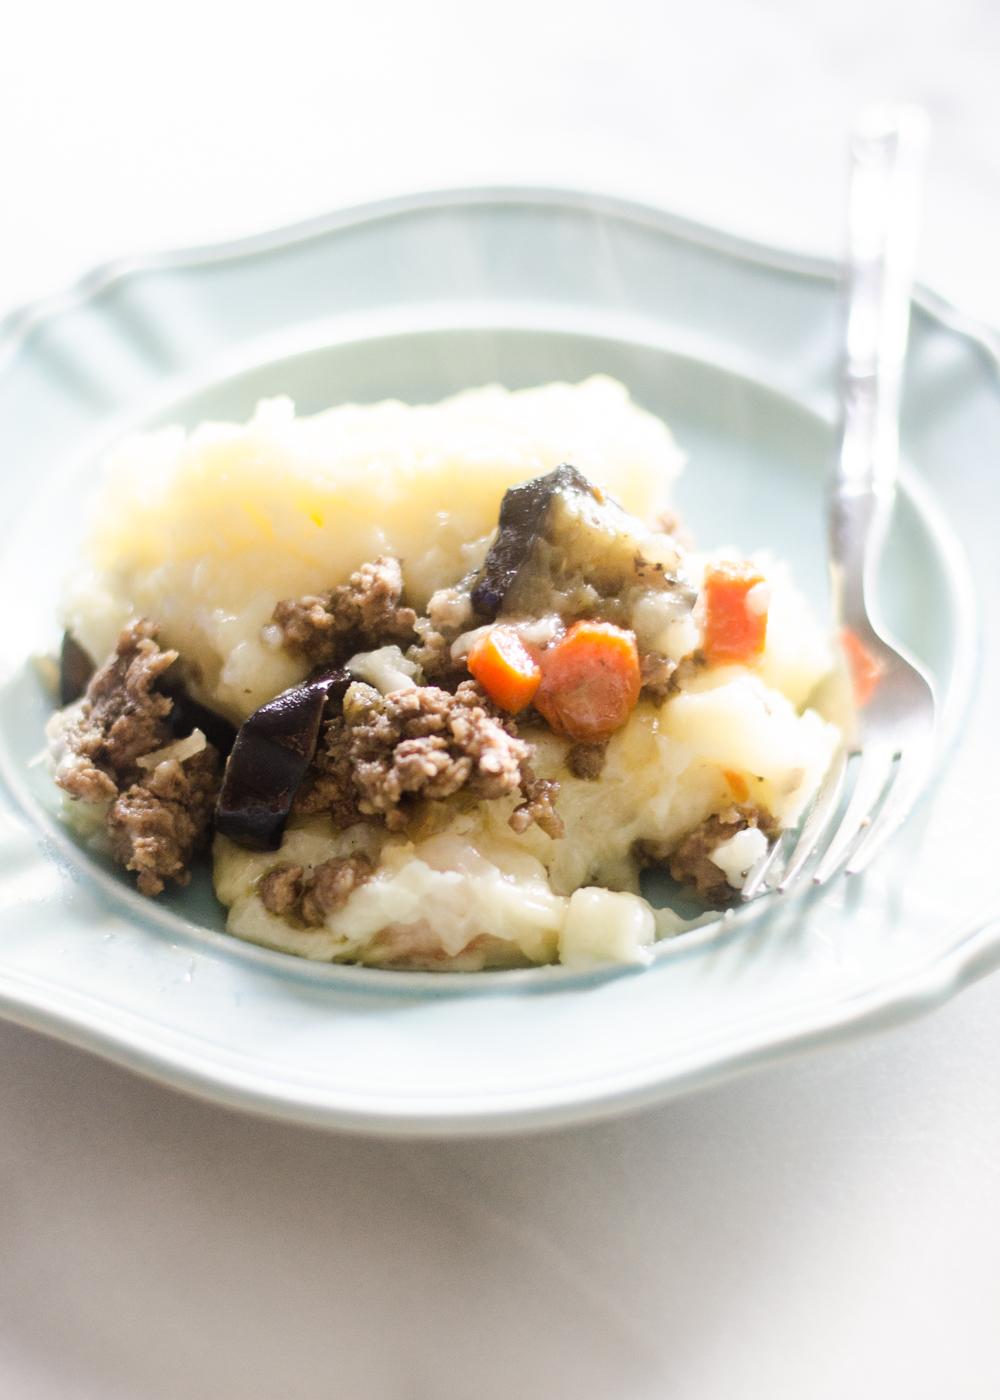 Butcher Box Review Meal 7 - Shepherd's Pie